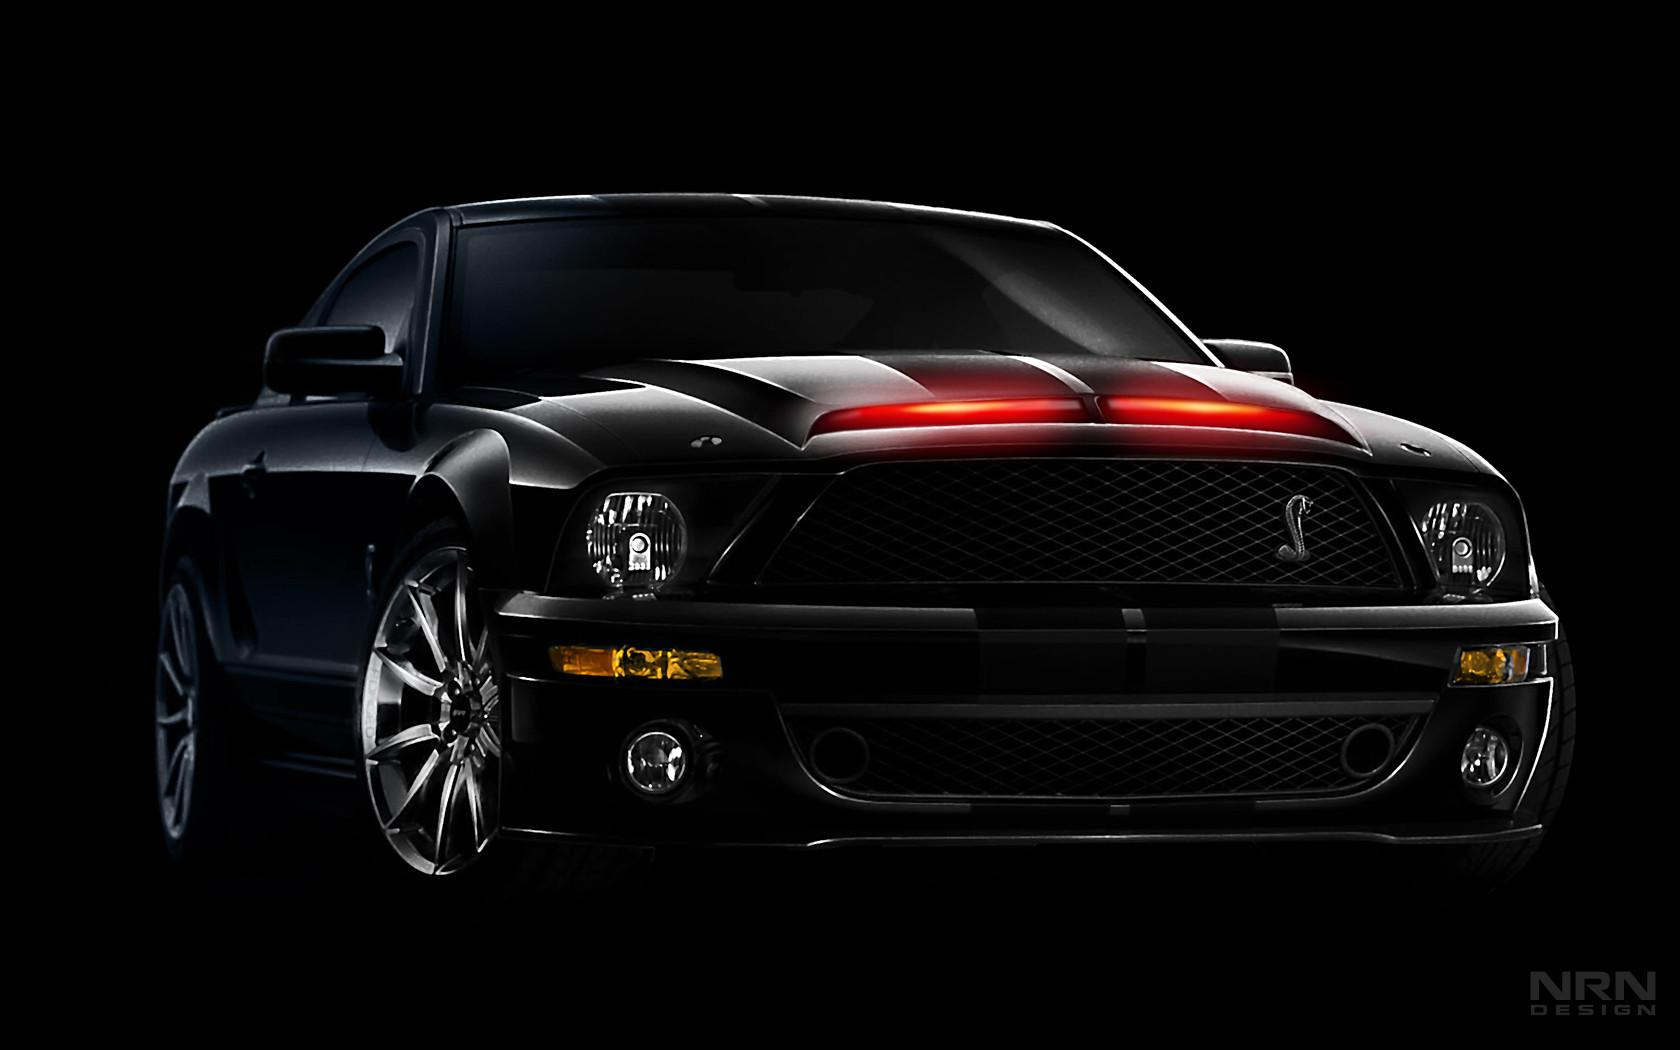 Ford Mustang Knight Rider Wallpaper Download Wallpaper Cars 1680x1050